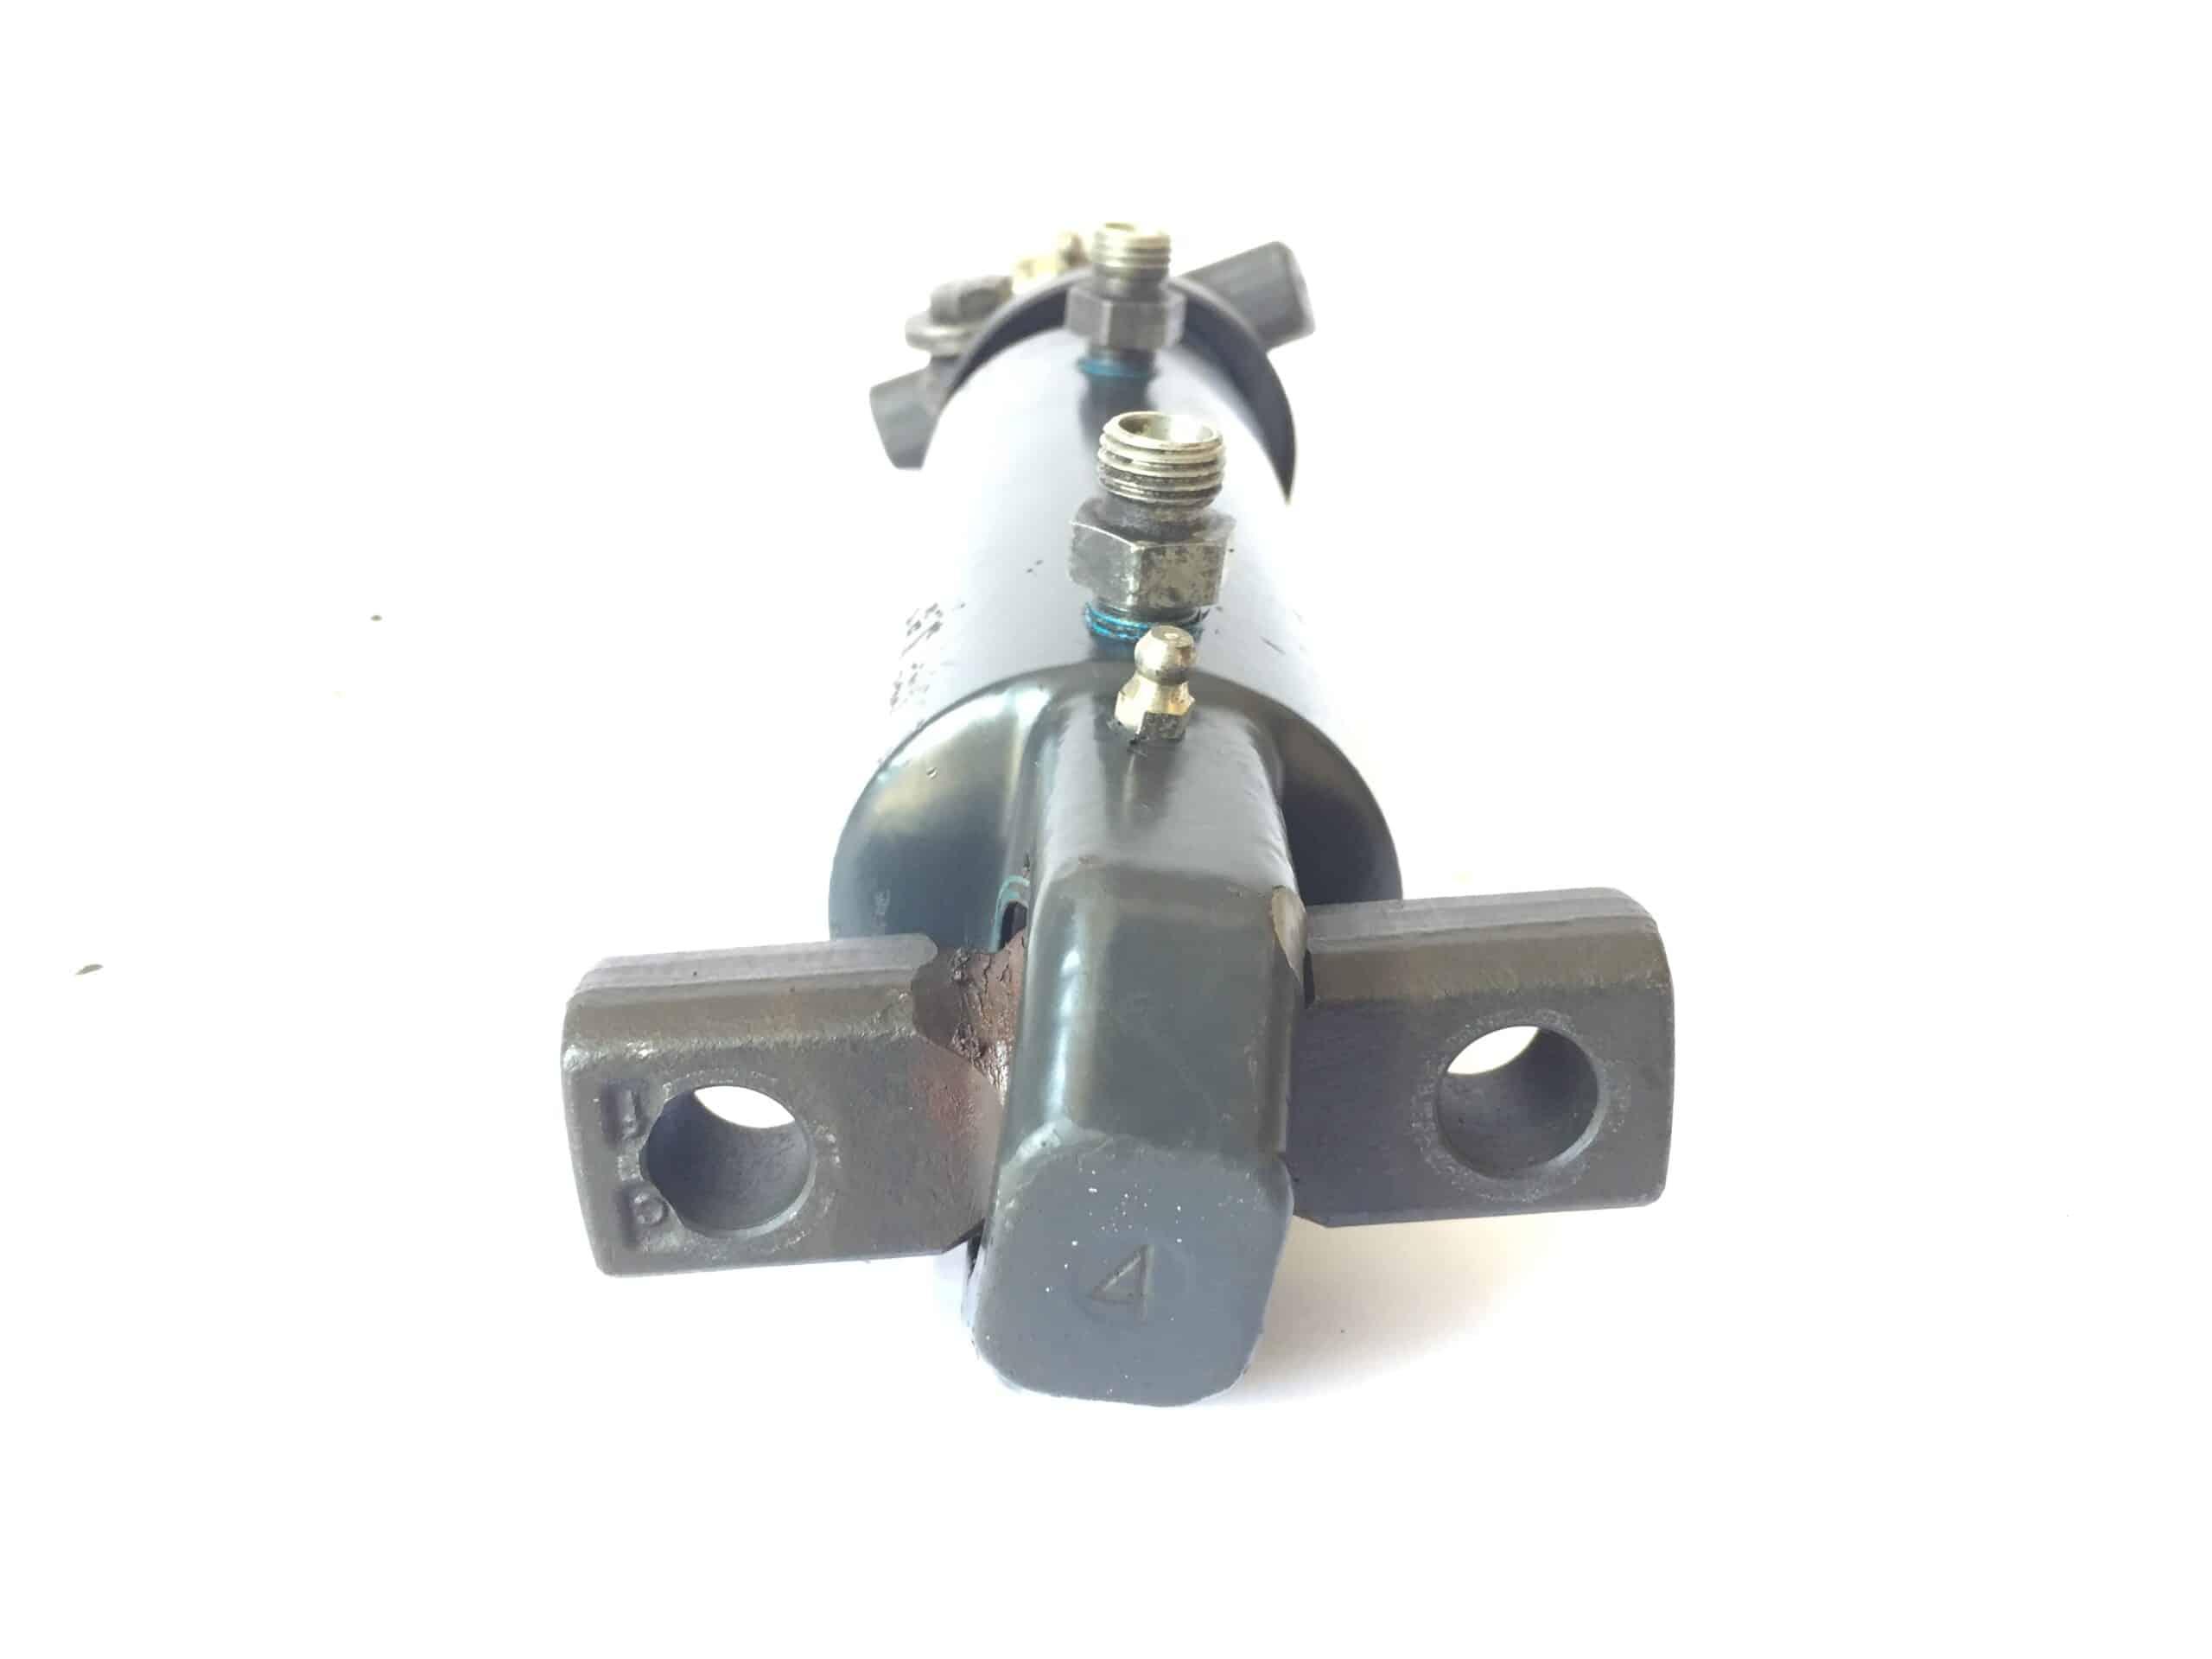   Cylinder Tilt assy.   Fazl-e-Rasheed and Company October 2021